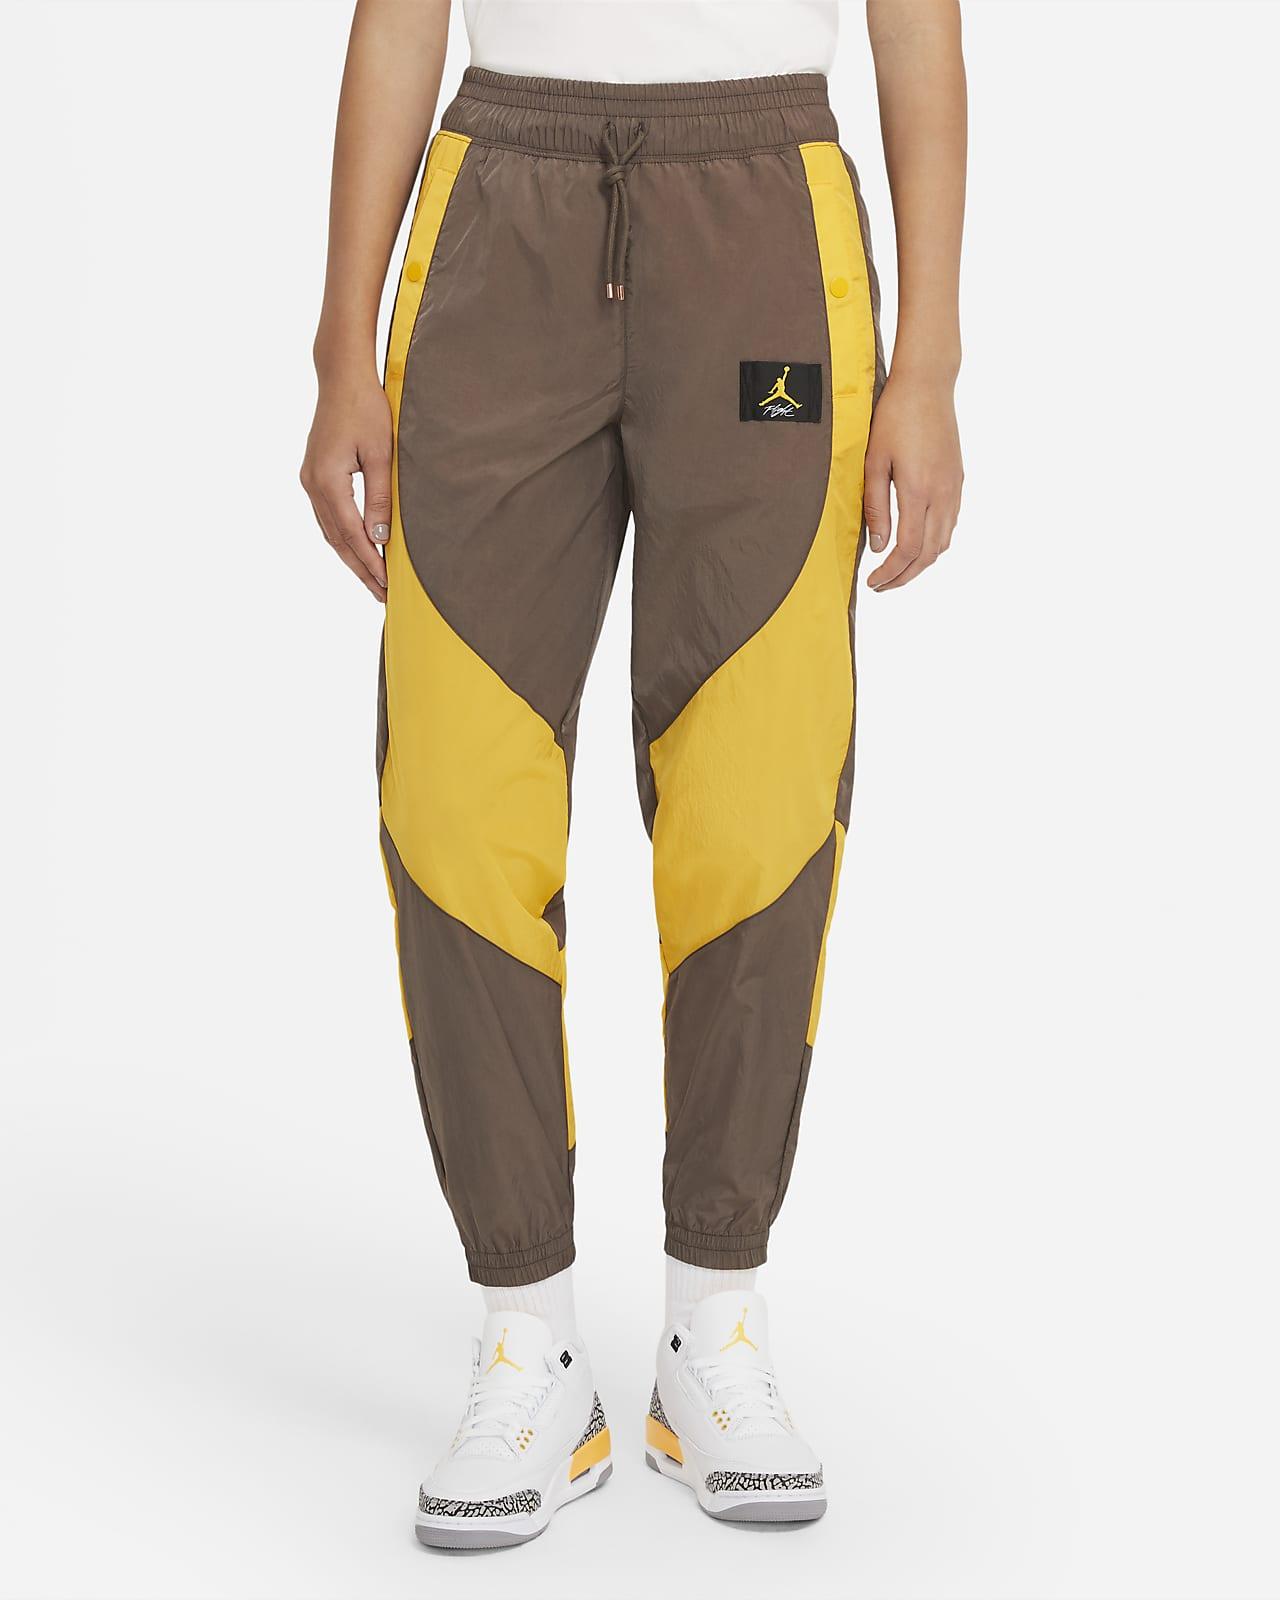 Jordan Damenhose aus Webmaterial